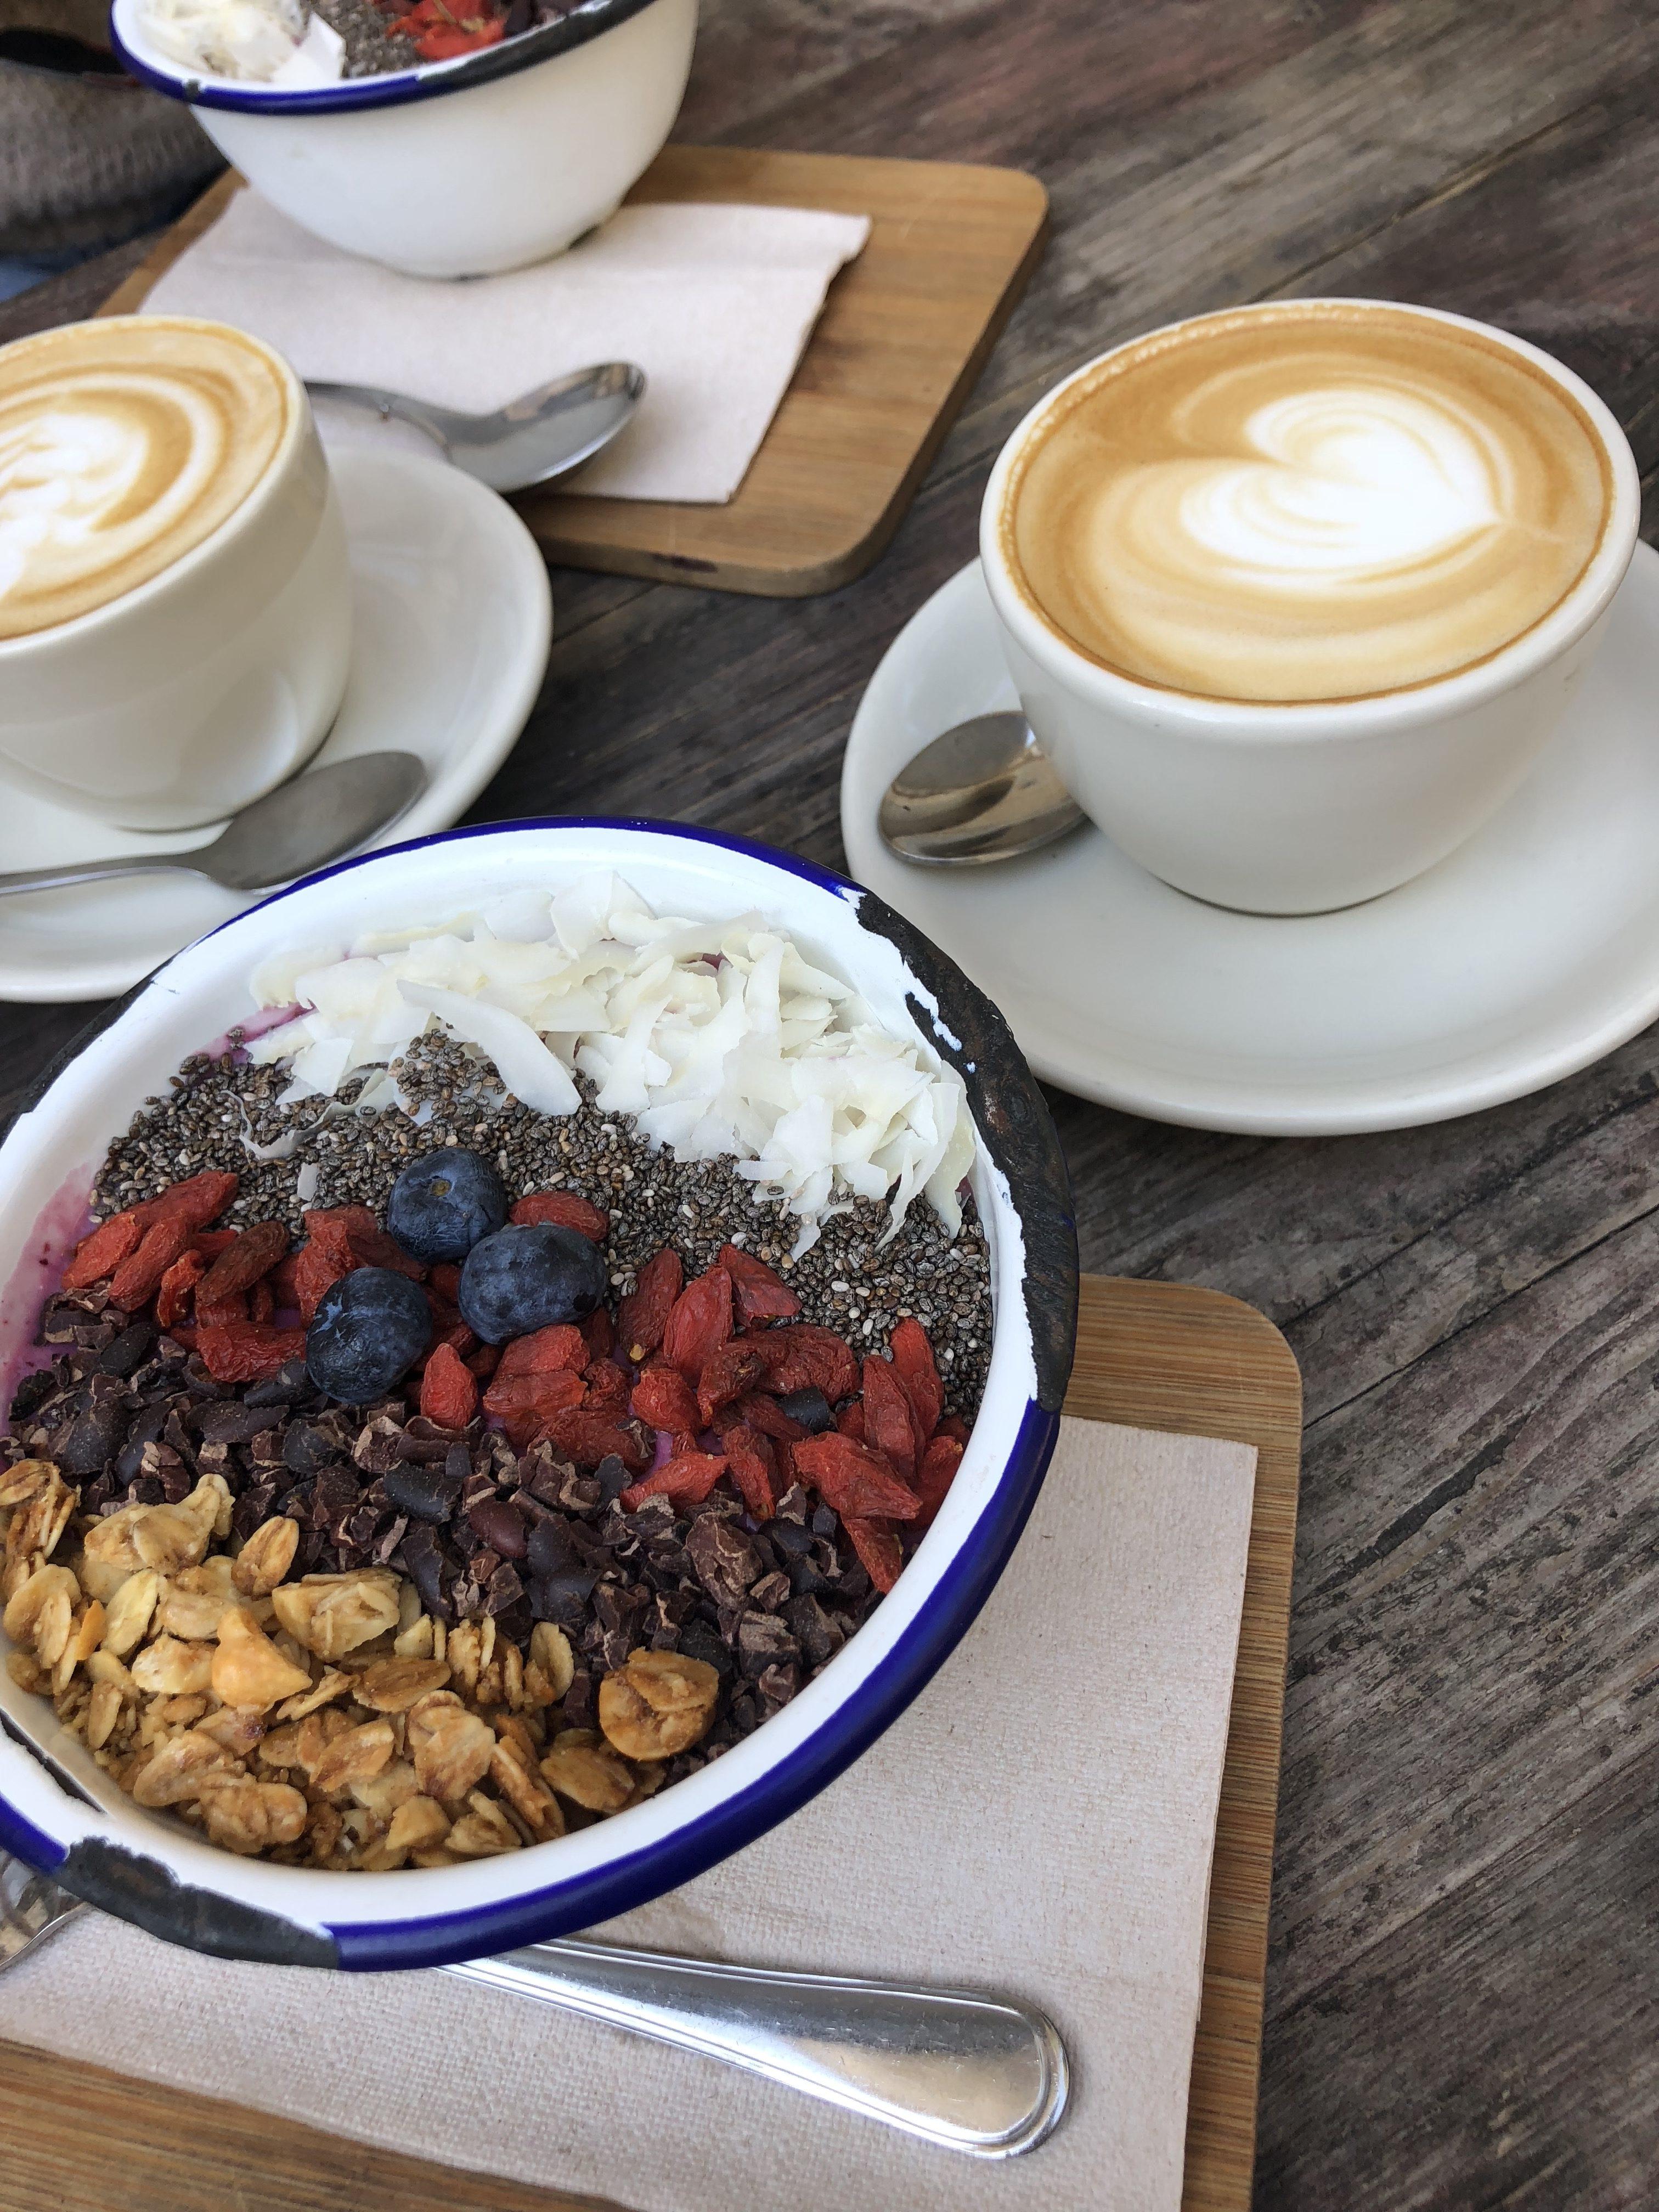 distrikt coffee berlin acai bowl